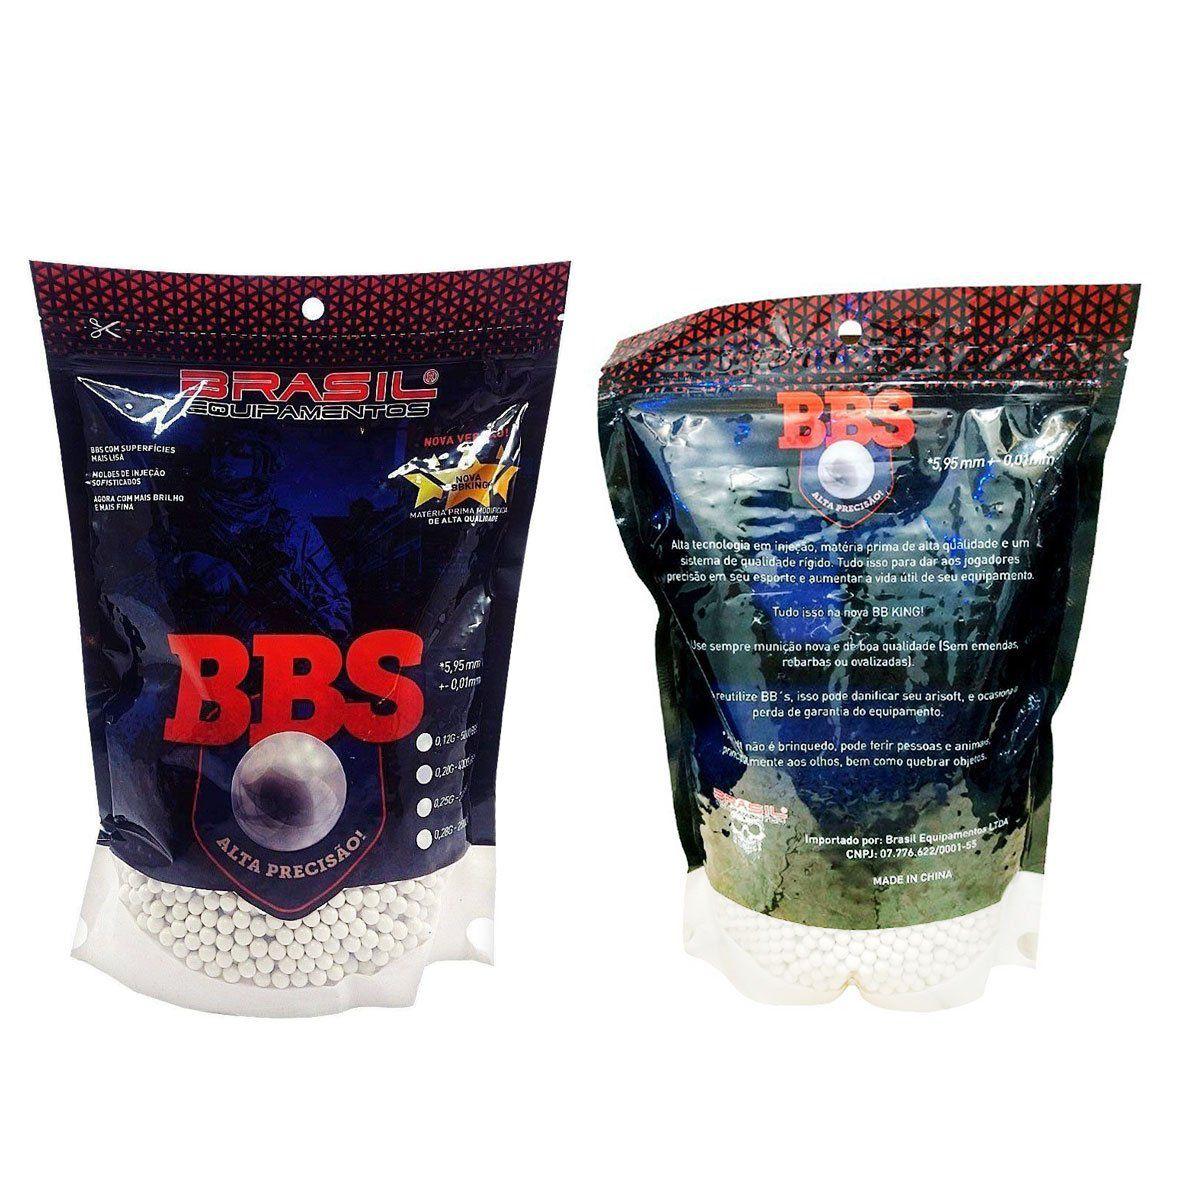 Esferas Plásticas BBs Brasil Equipamentos Calibre 6mm 0,25g 3000un